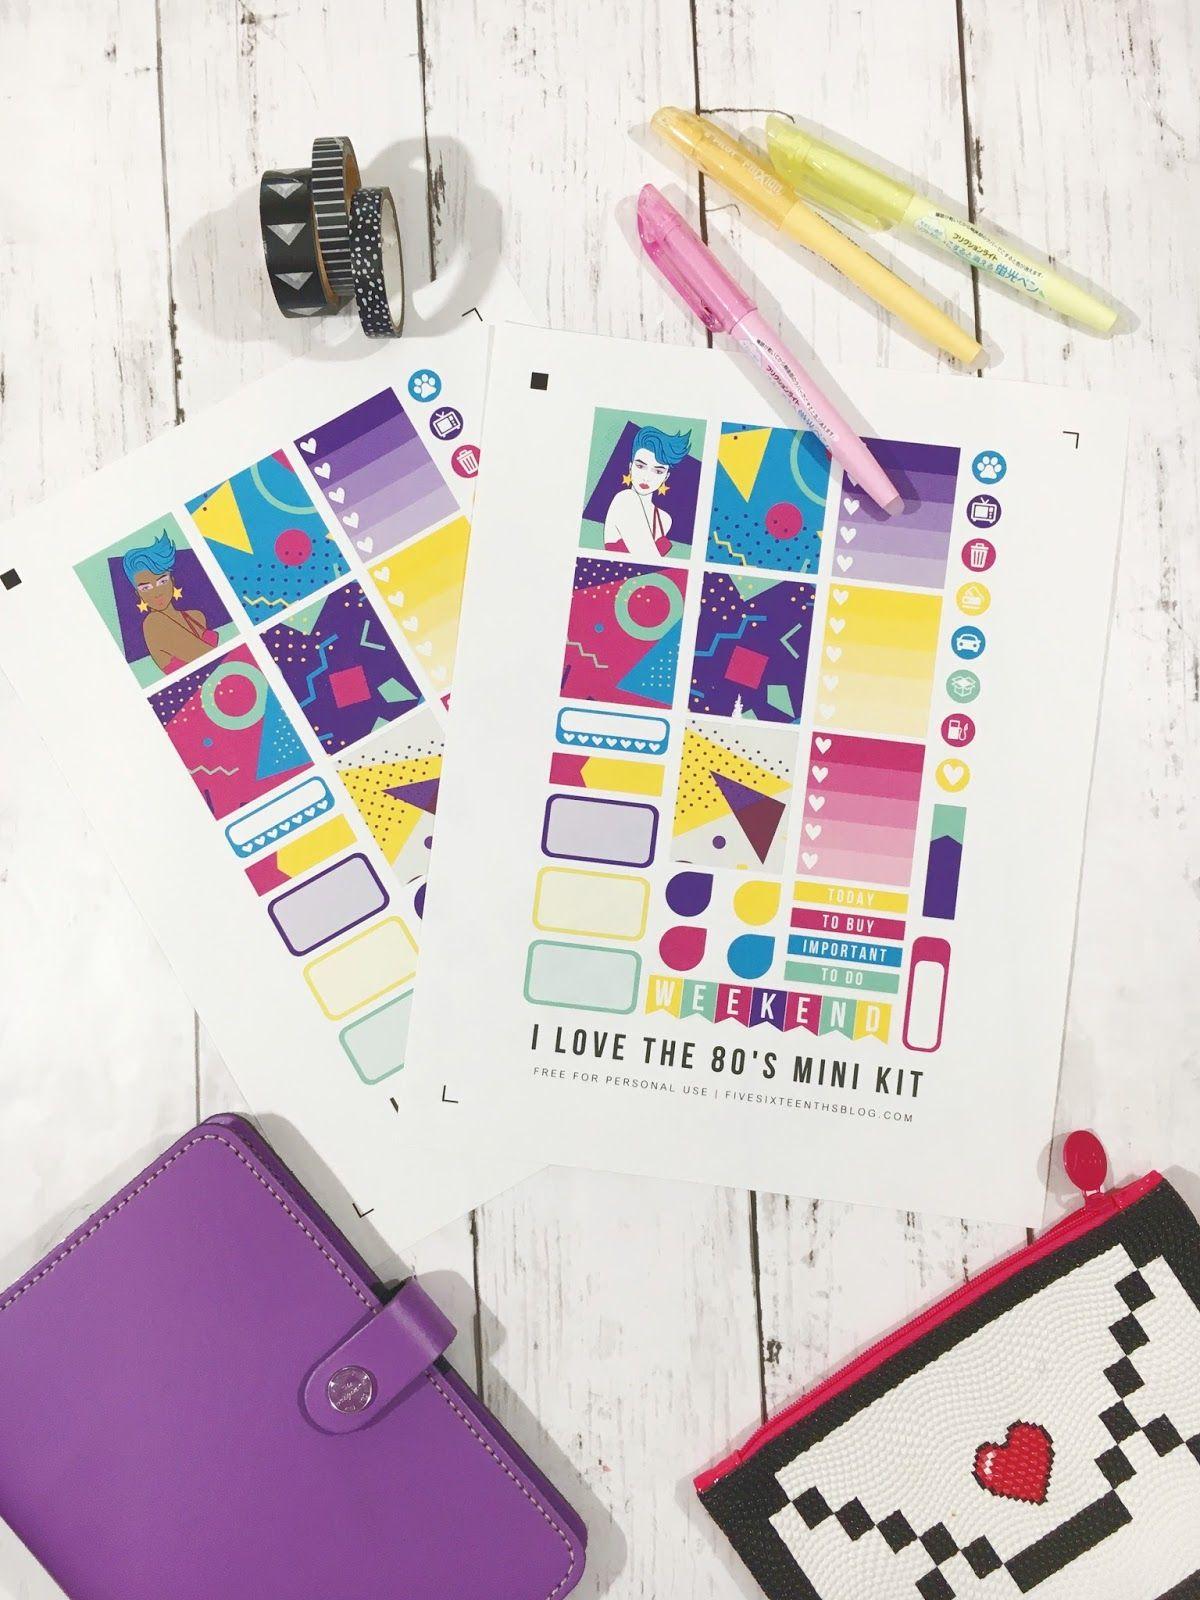 99 Make Your Own Sticker Amazon Com Decal Works Custom